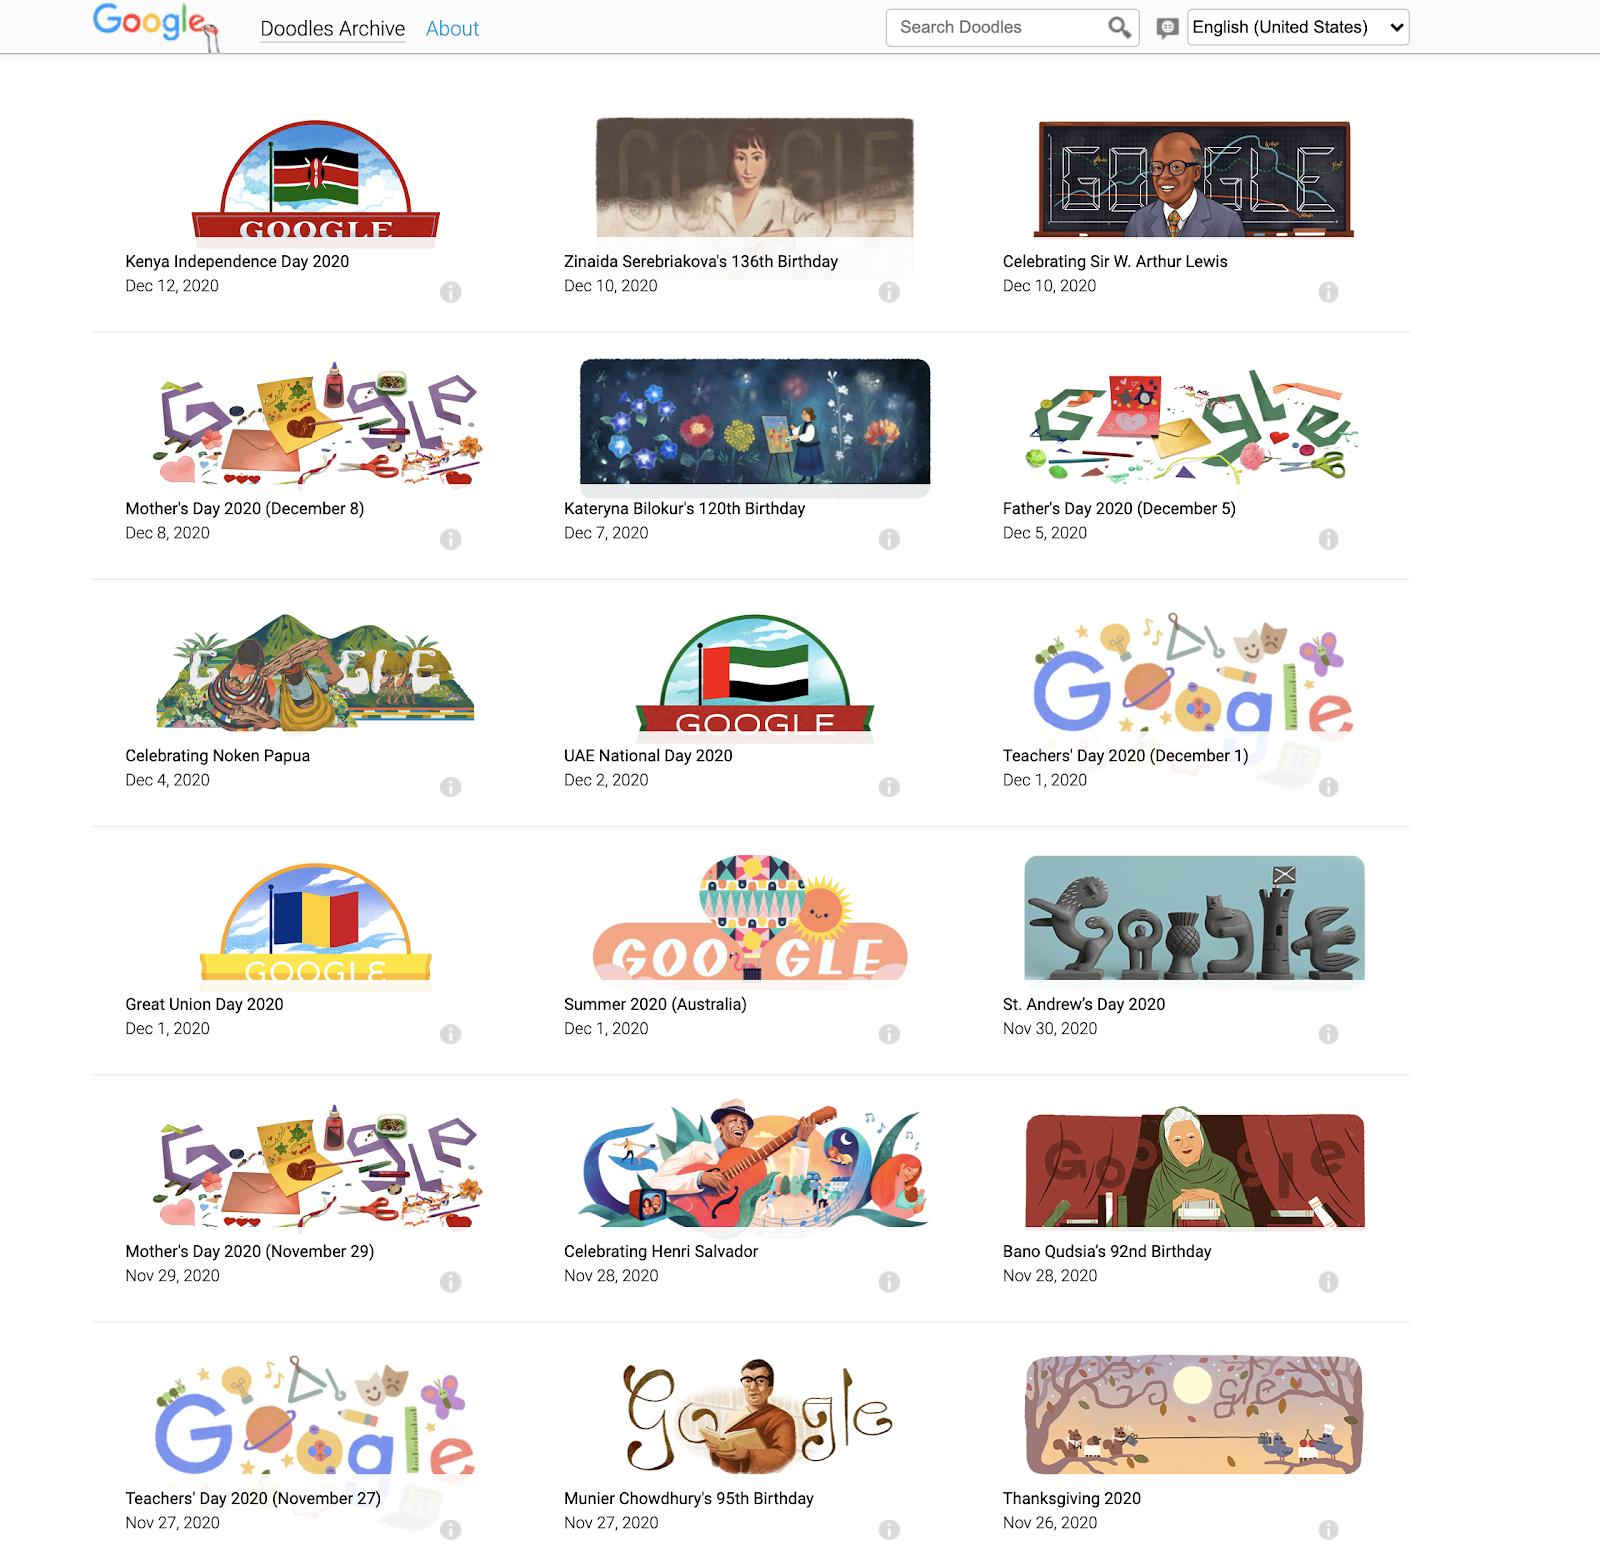 A screenshot of Google's past doodles.